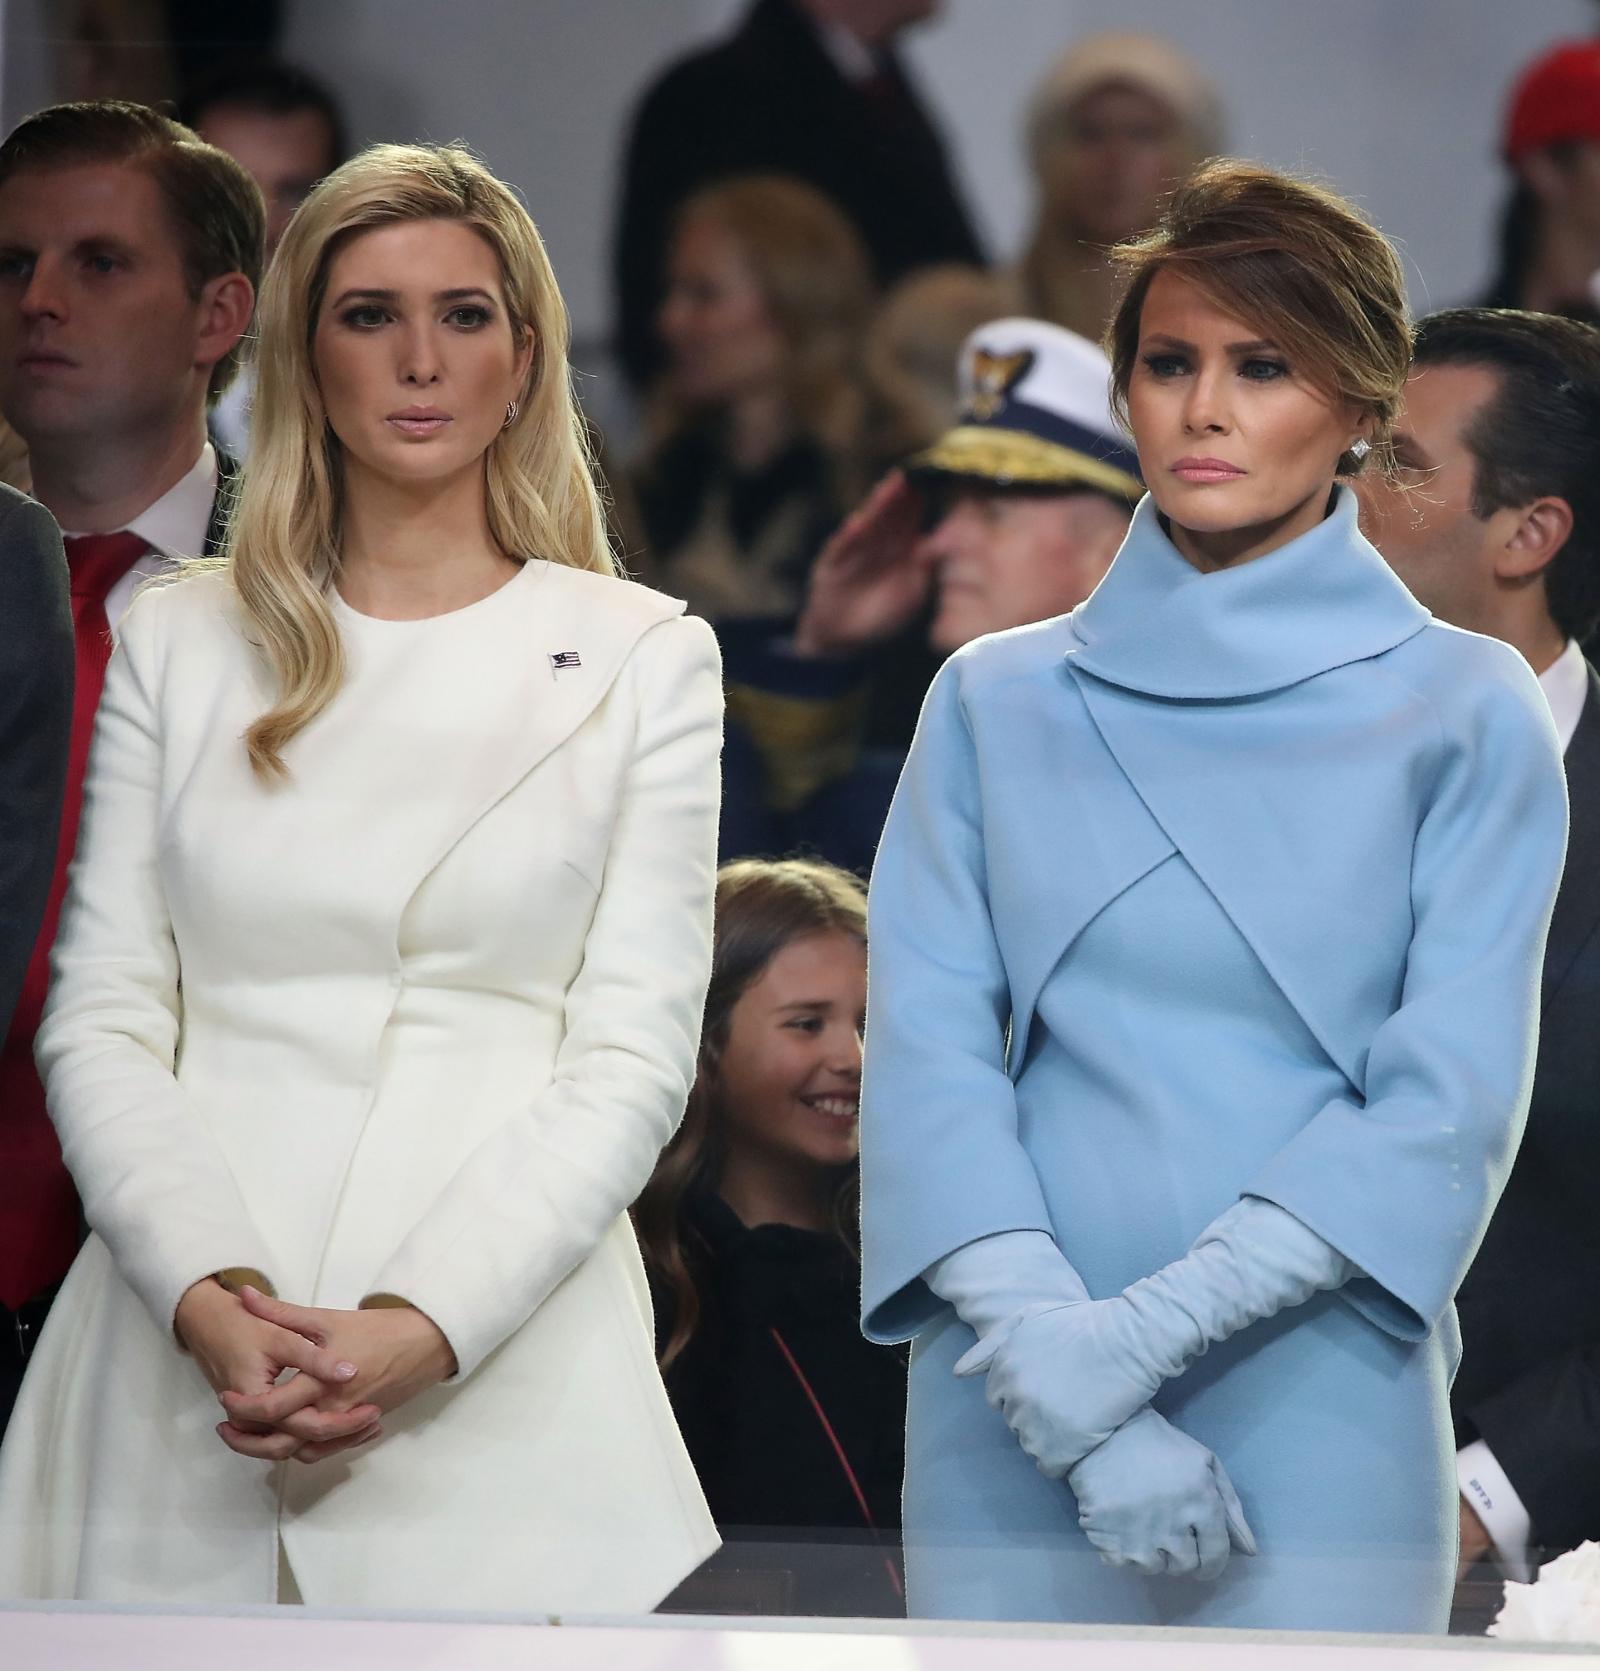 First Lady Melania Trump and Ivanka Trump